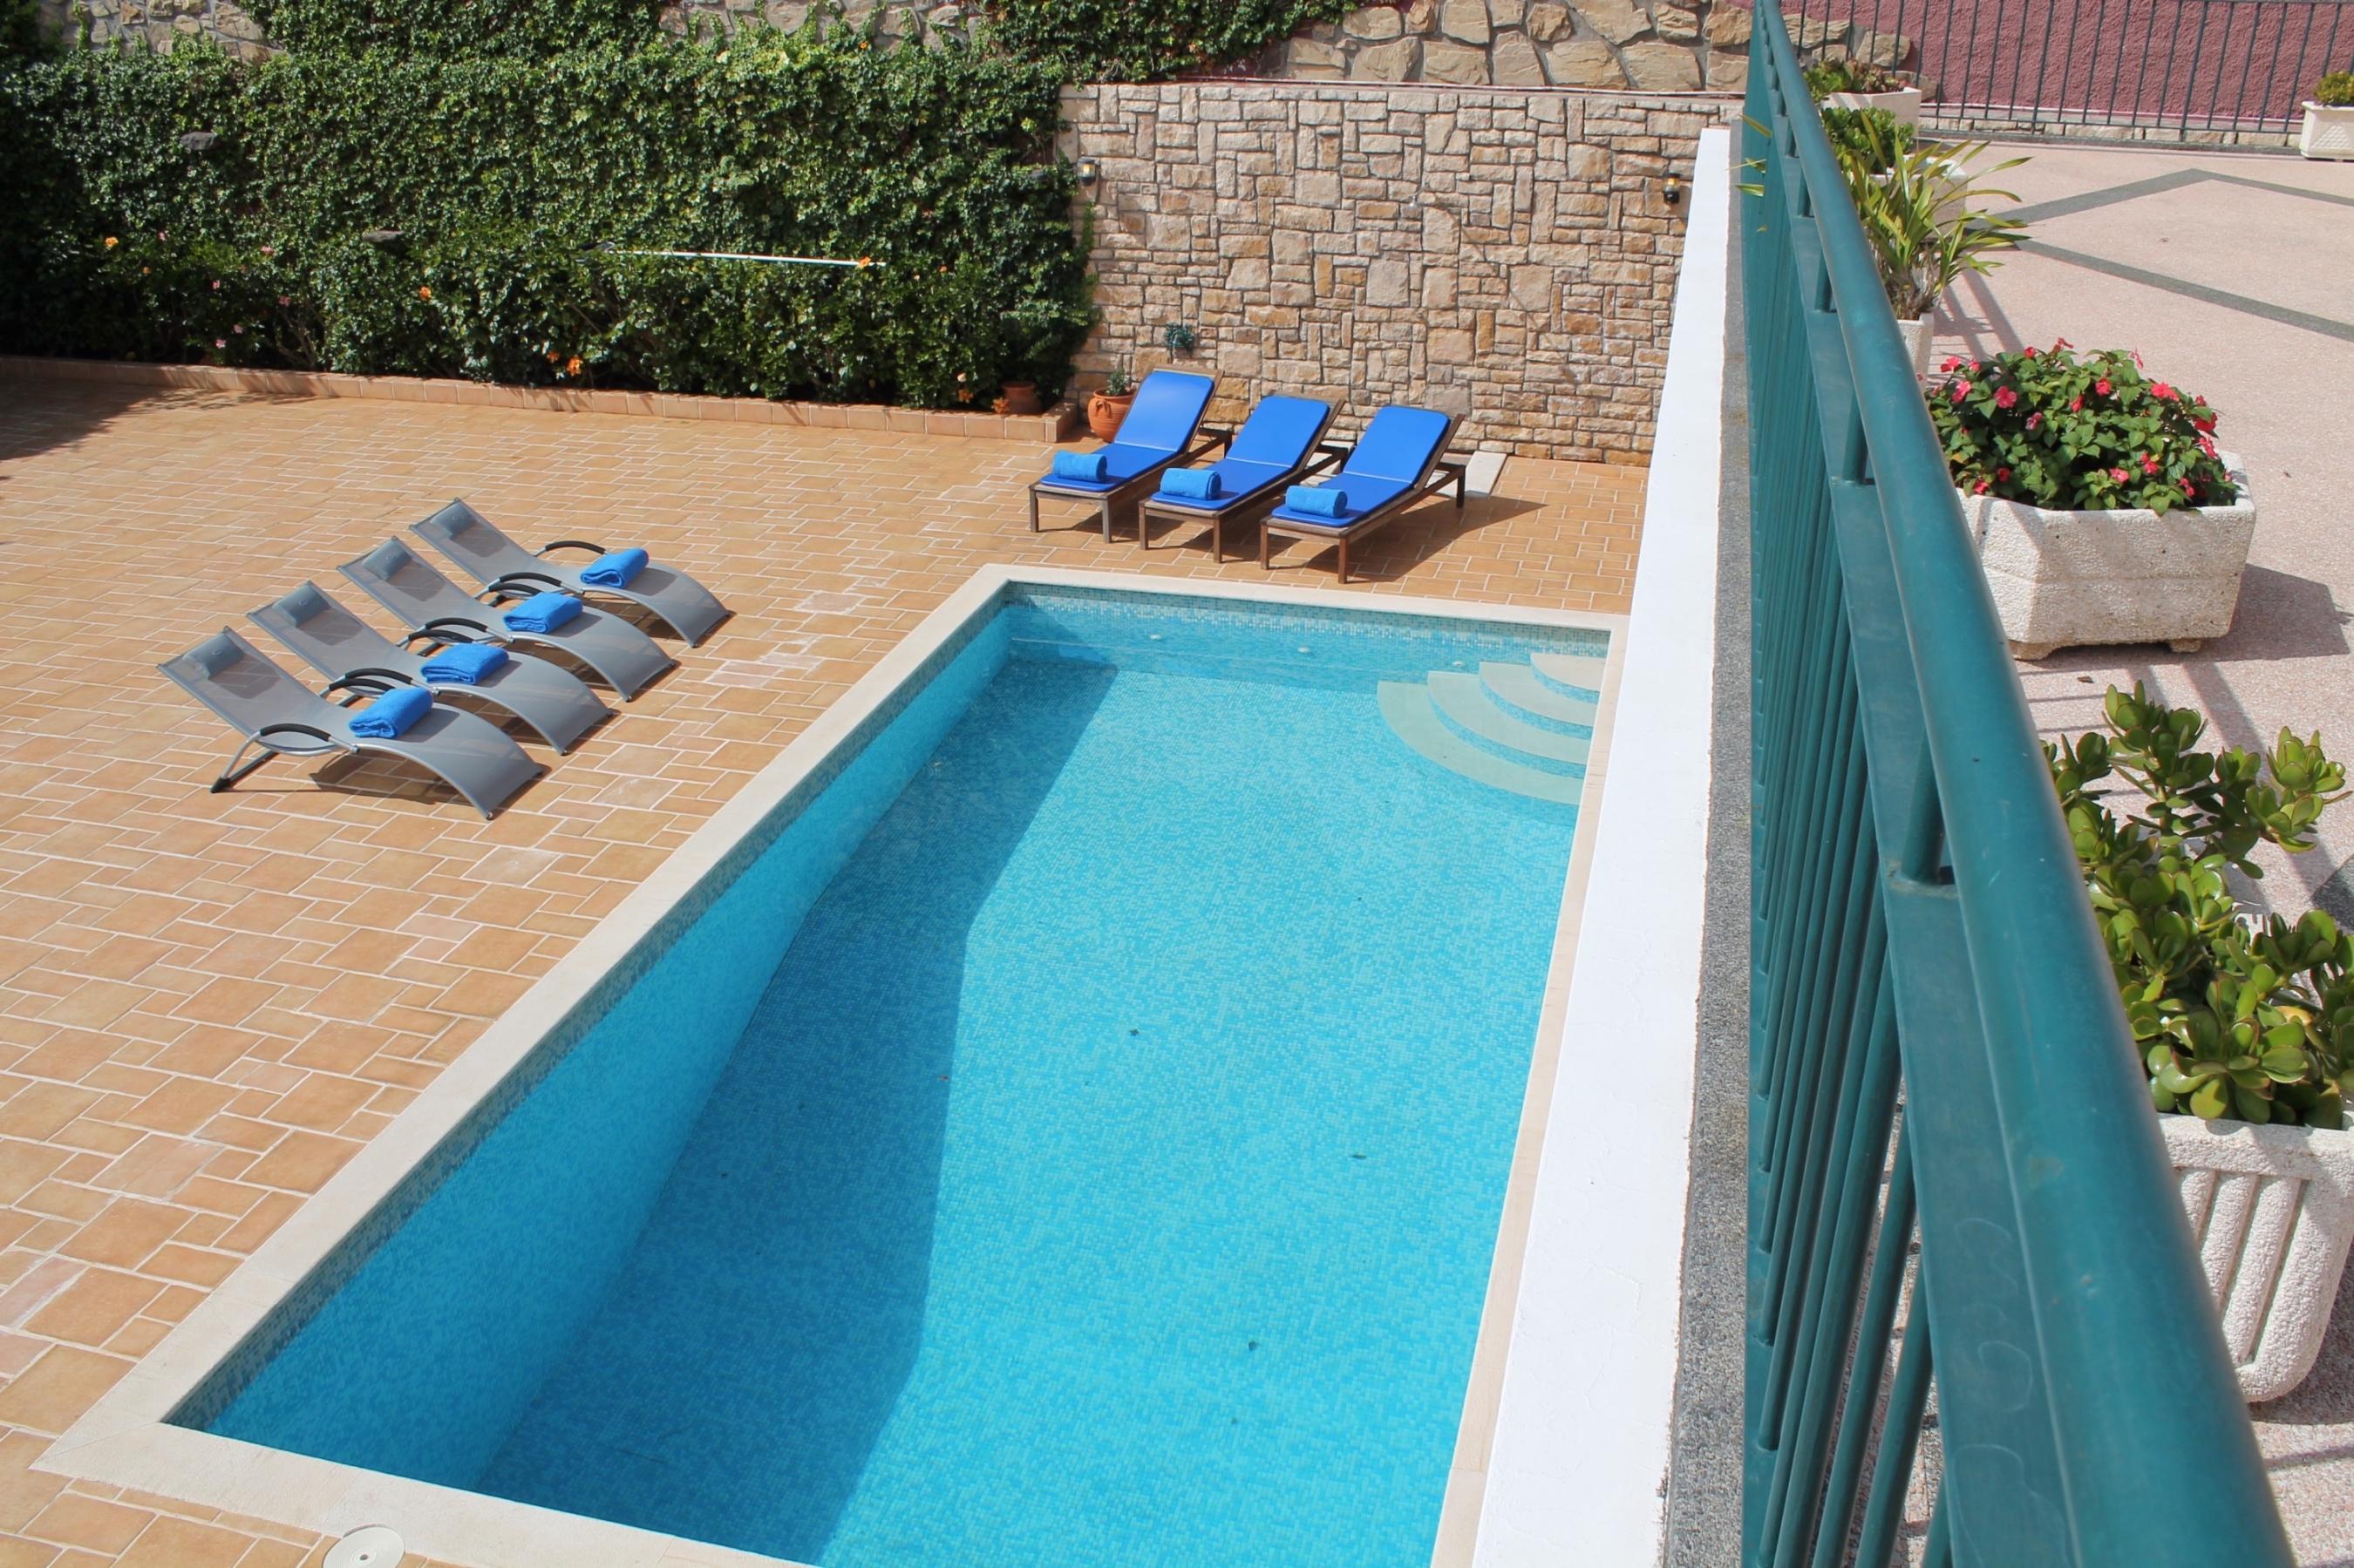 Superb refurbished villa heated pool close to facilities